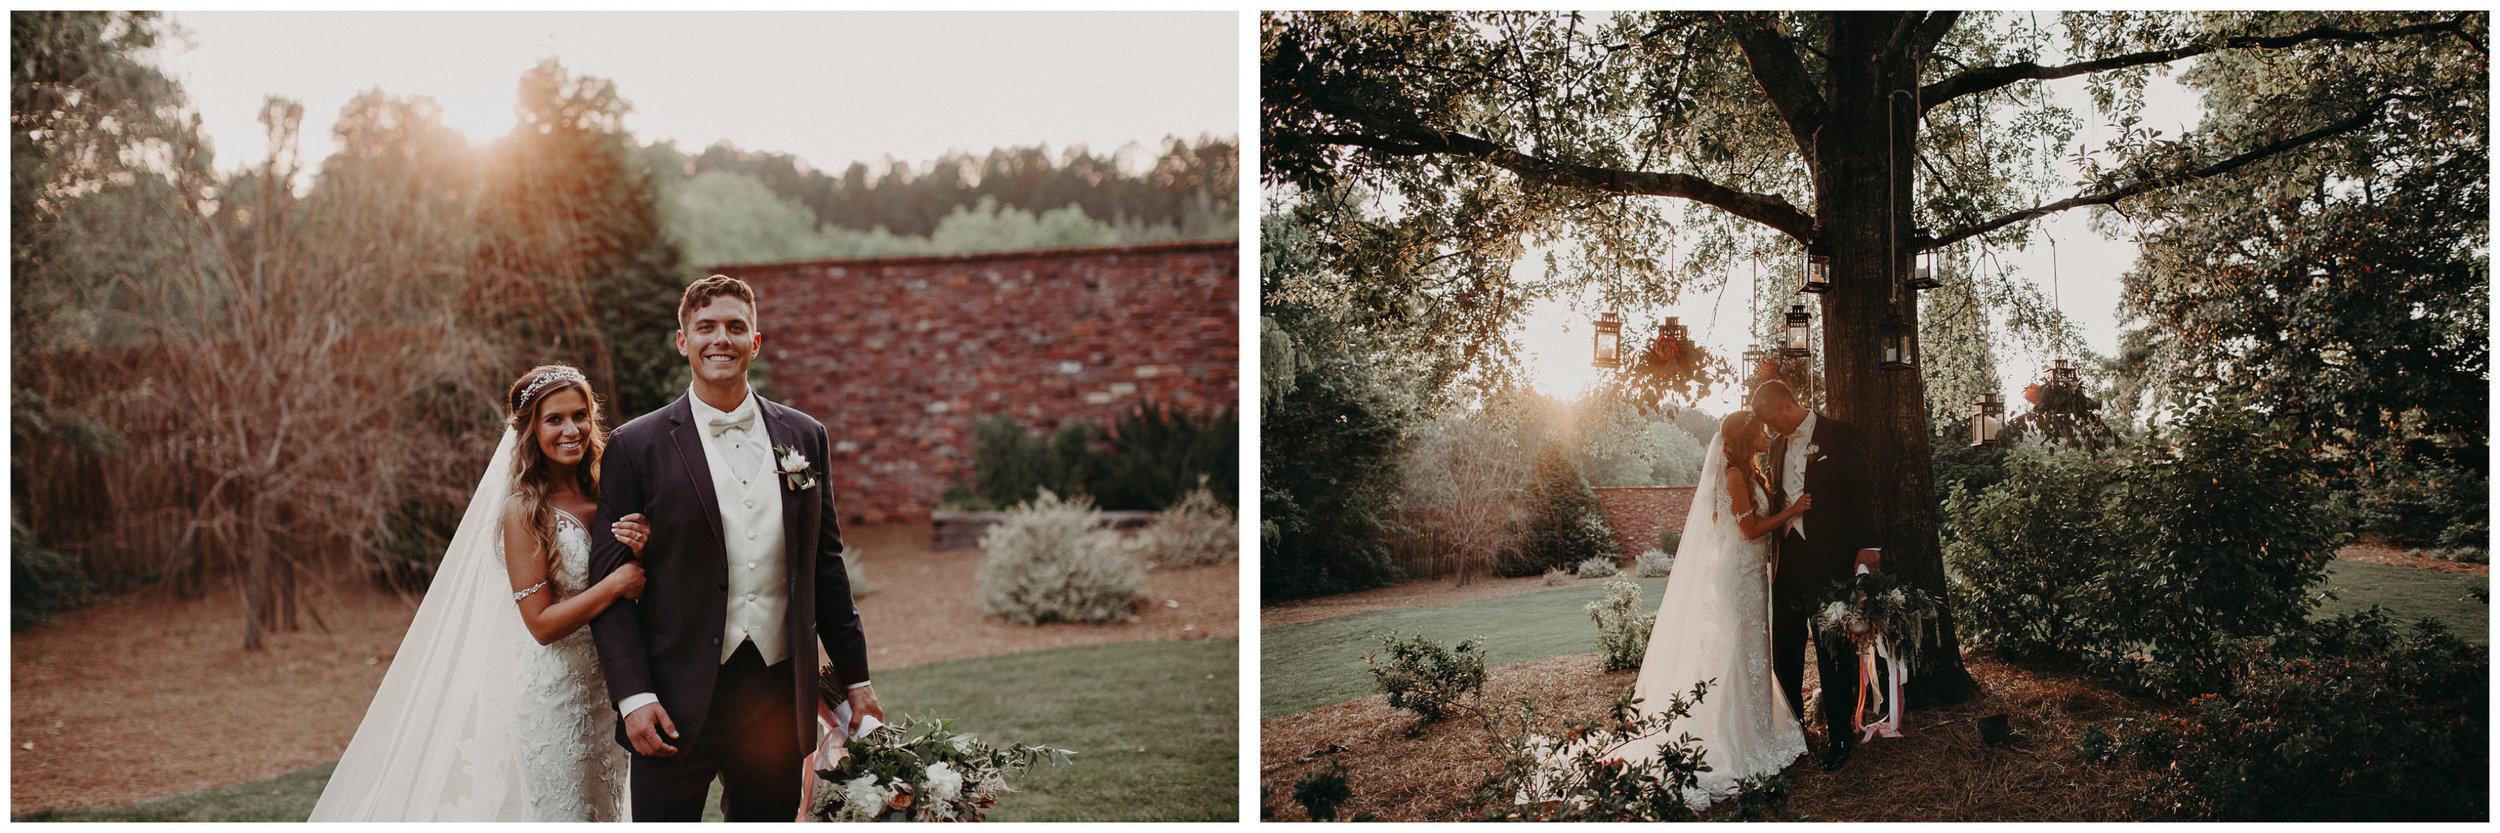 79Carl House Wedding Venue Ga, Atlanta Wedding Photographer - Boho, Bohemian, Junebug Weddings, Vintage, Retro, Trendy. Aline Marin Photography. .jpg